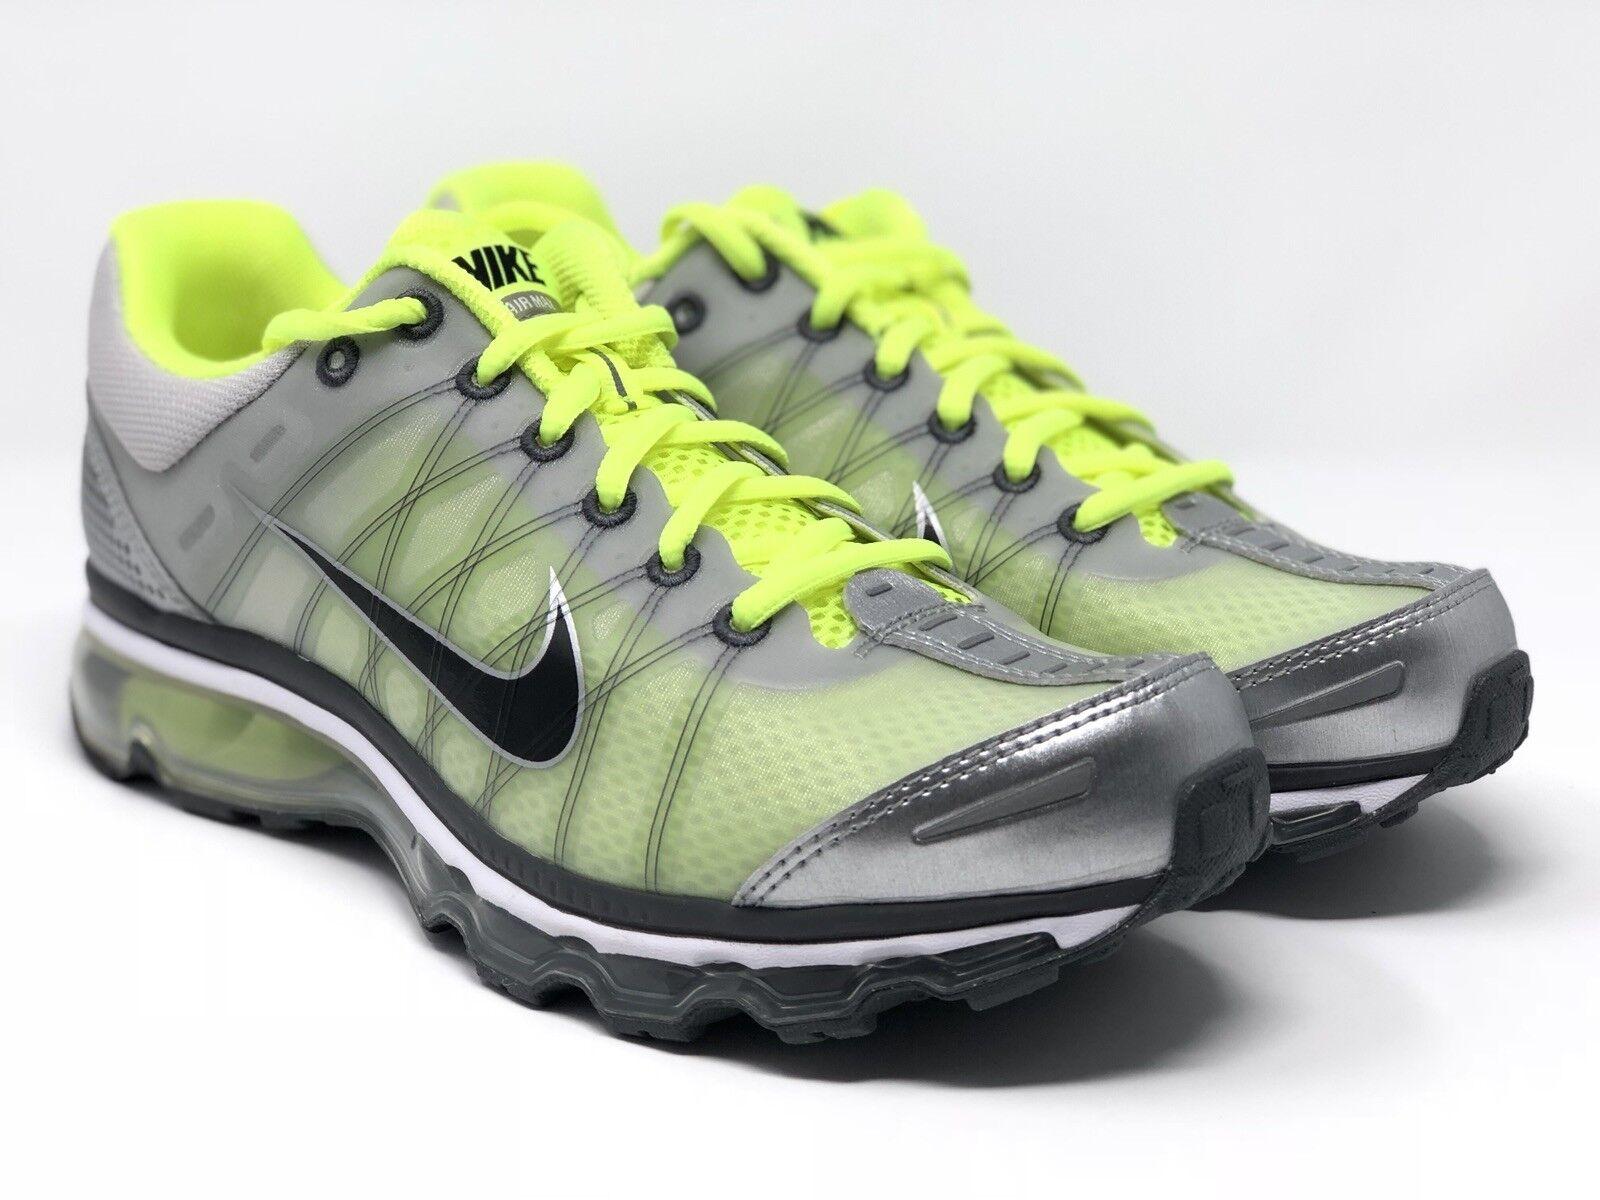 Nike Air Max 2018 Shoes Neutral Grey/Volt Men's New 486978-017 Size 7.5